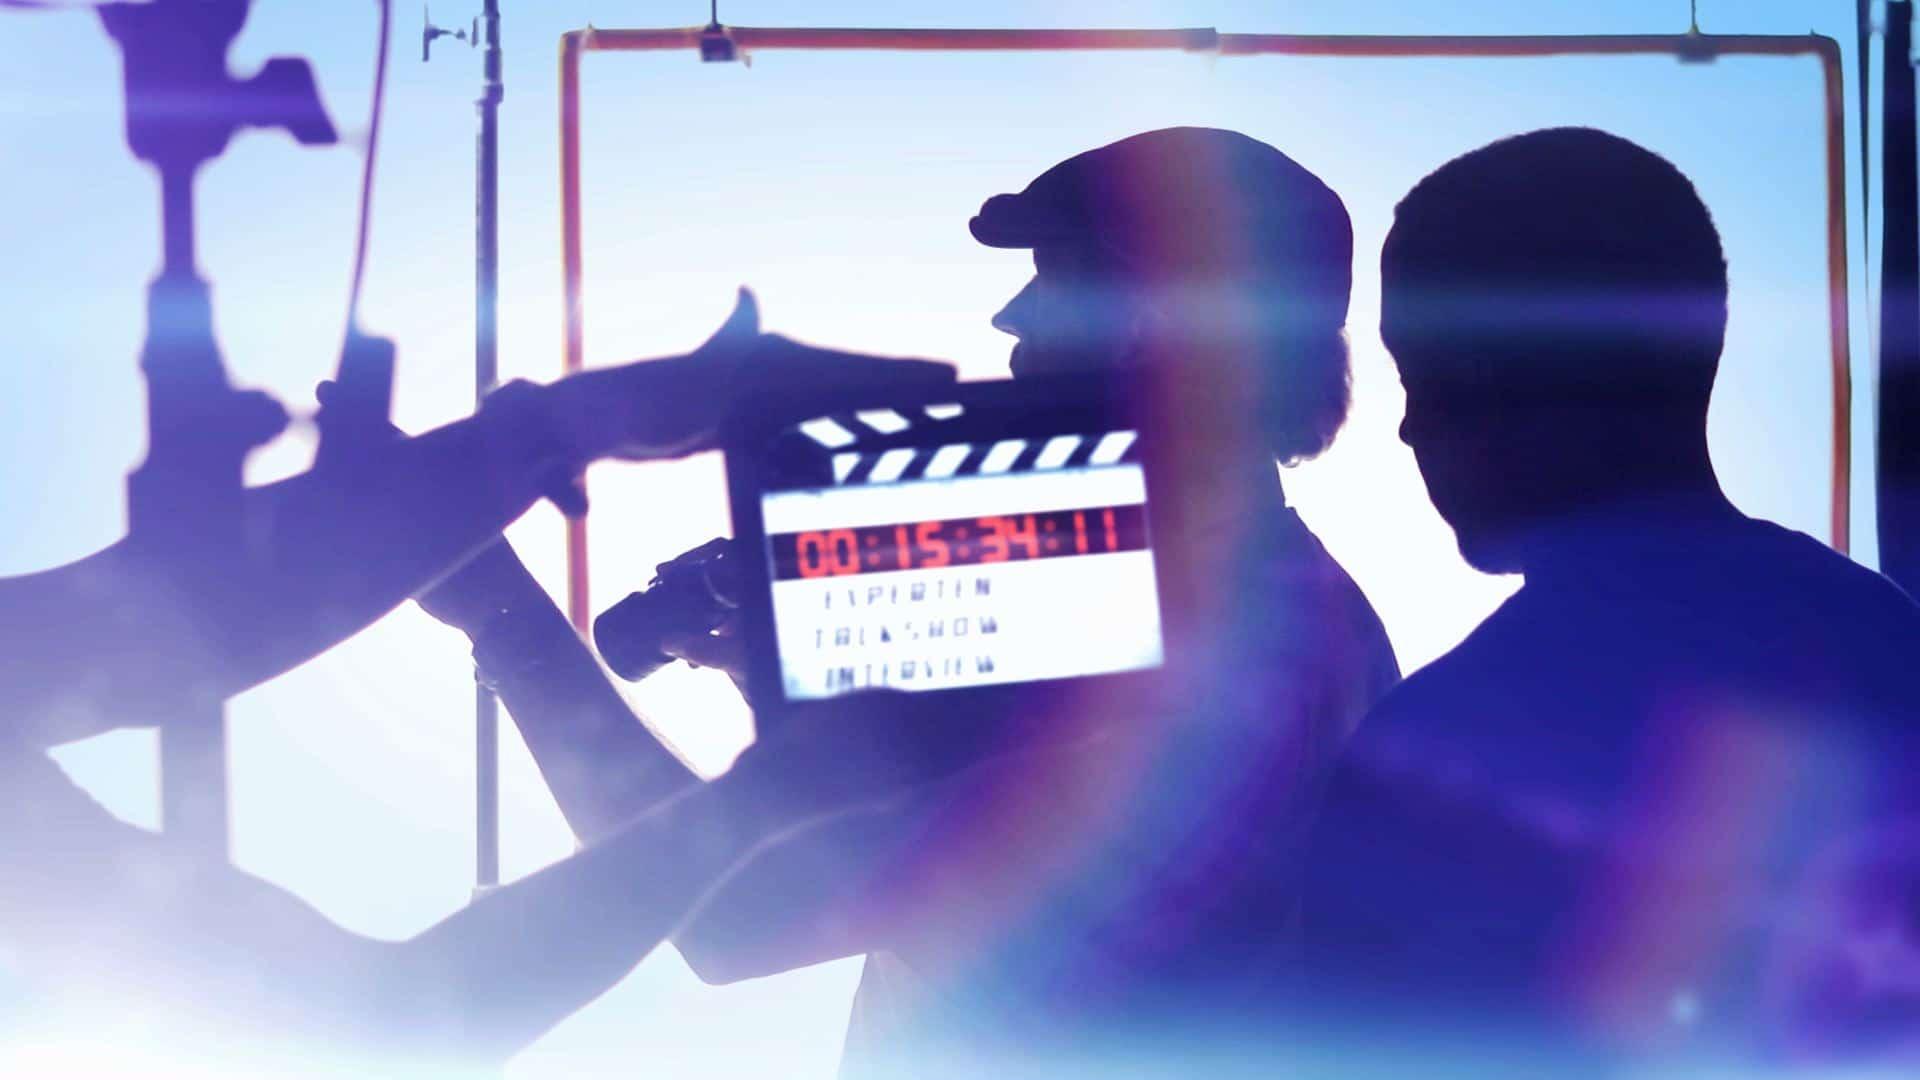 Expertentalkshow: TV-Studio Regie am Set mit Klappe